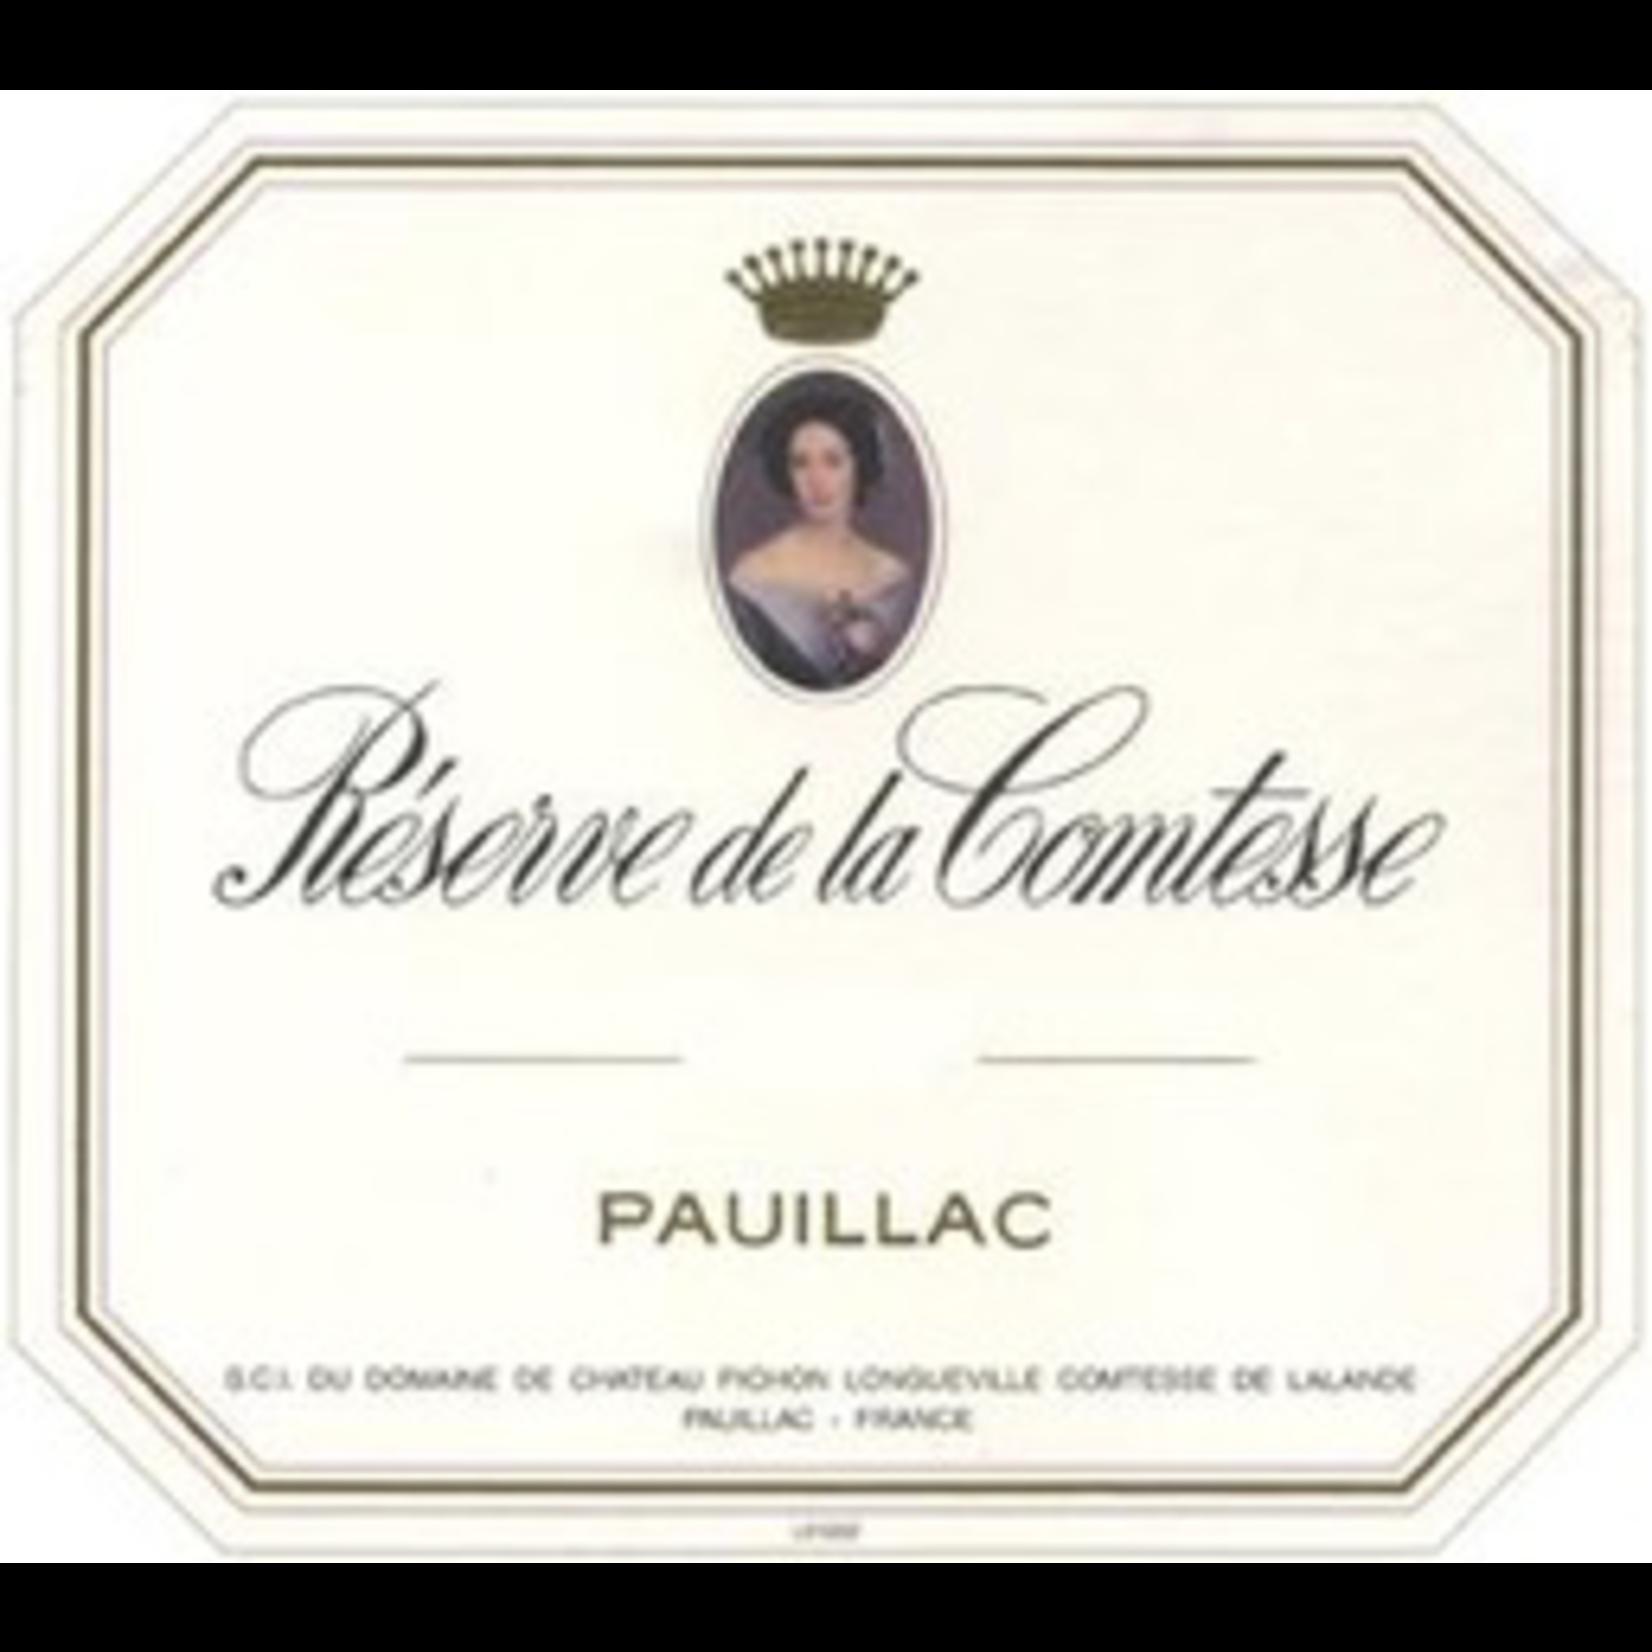 Wine Reserve de la Comtesse Pauillac 2018